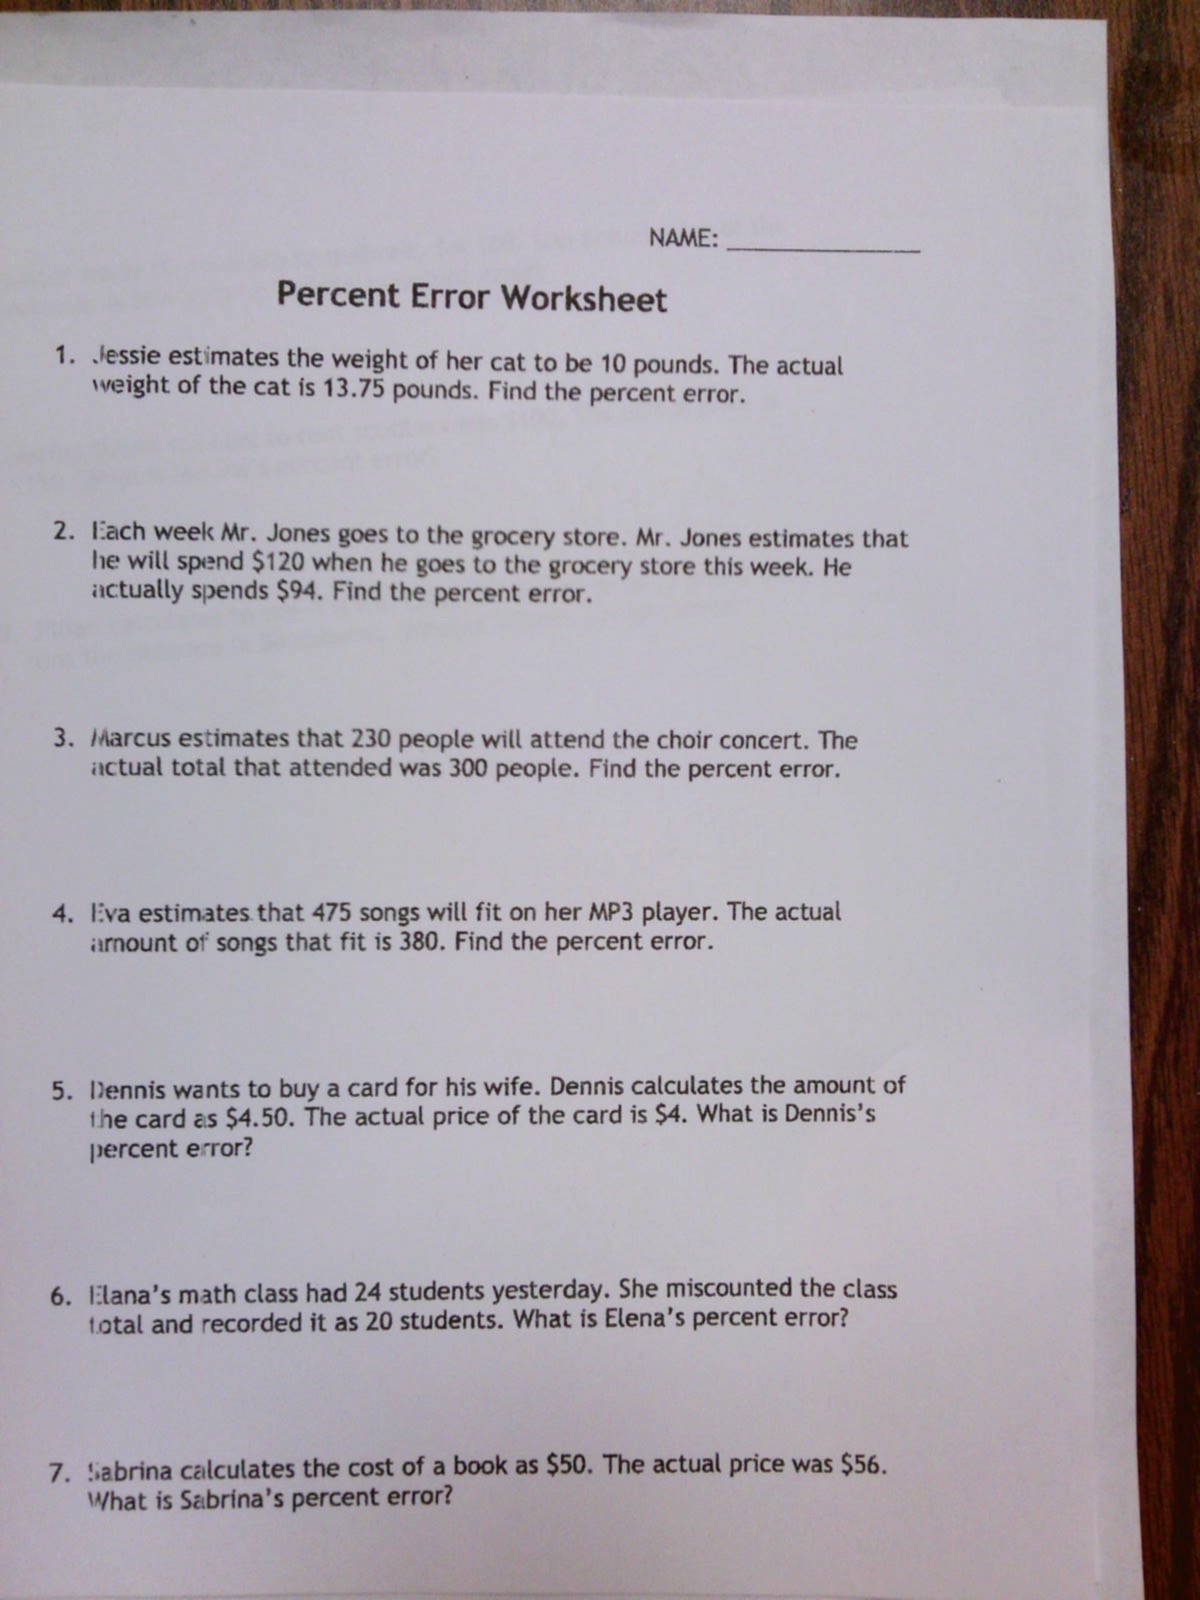 31 Percent Error Worksheet Answer Key